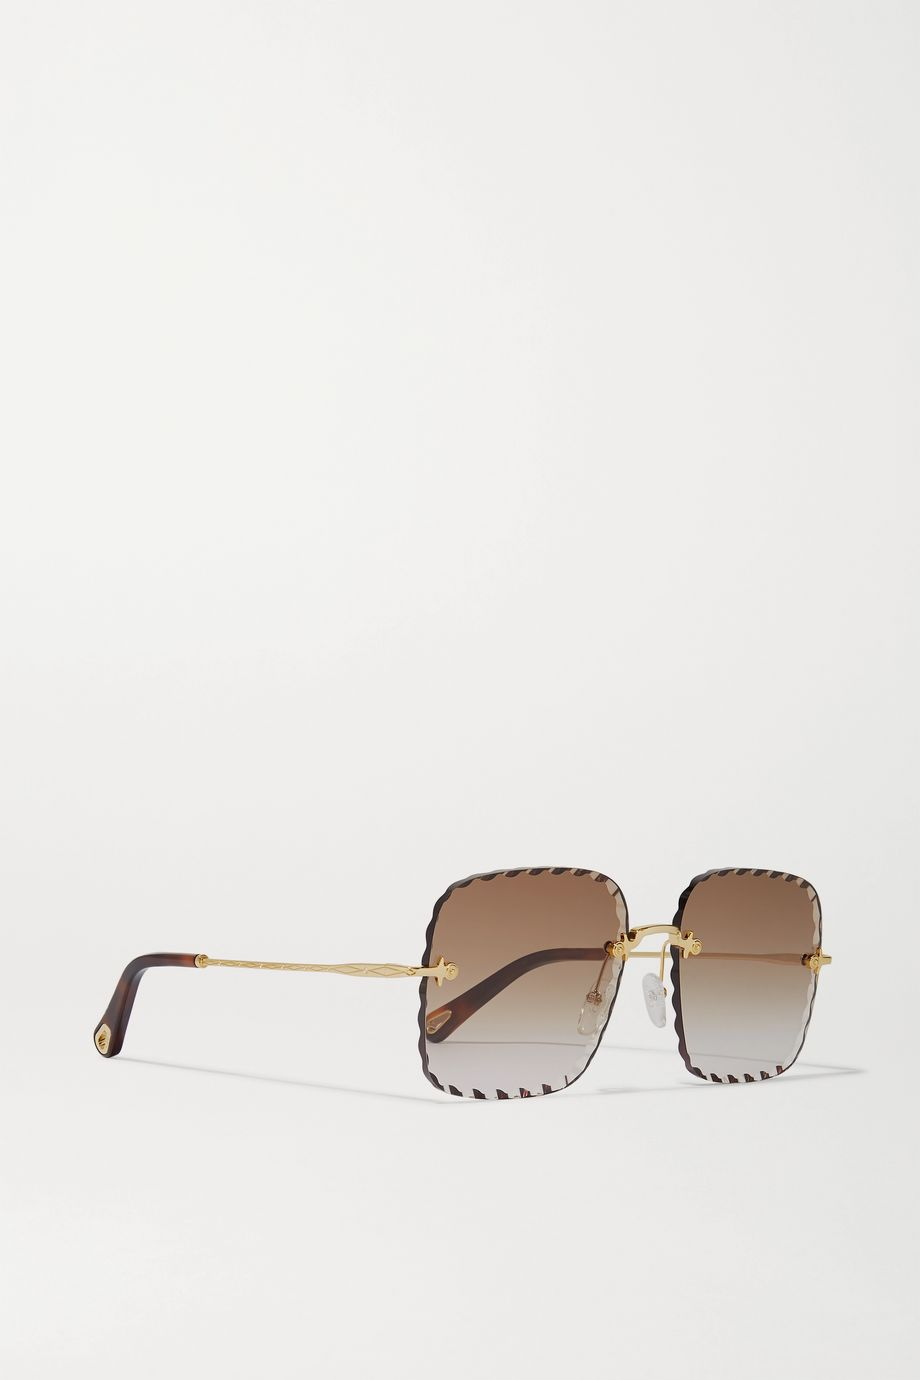 Chloé Rosie square-frame  gold-tone and tortoiseshell acetate sunglasses